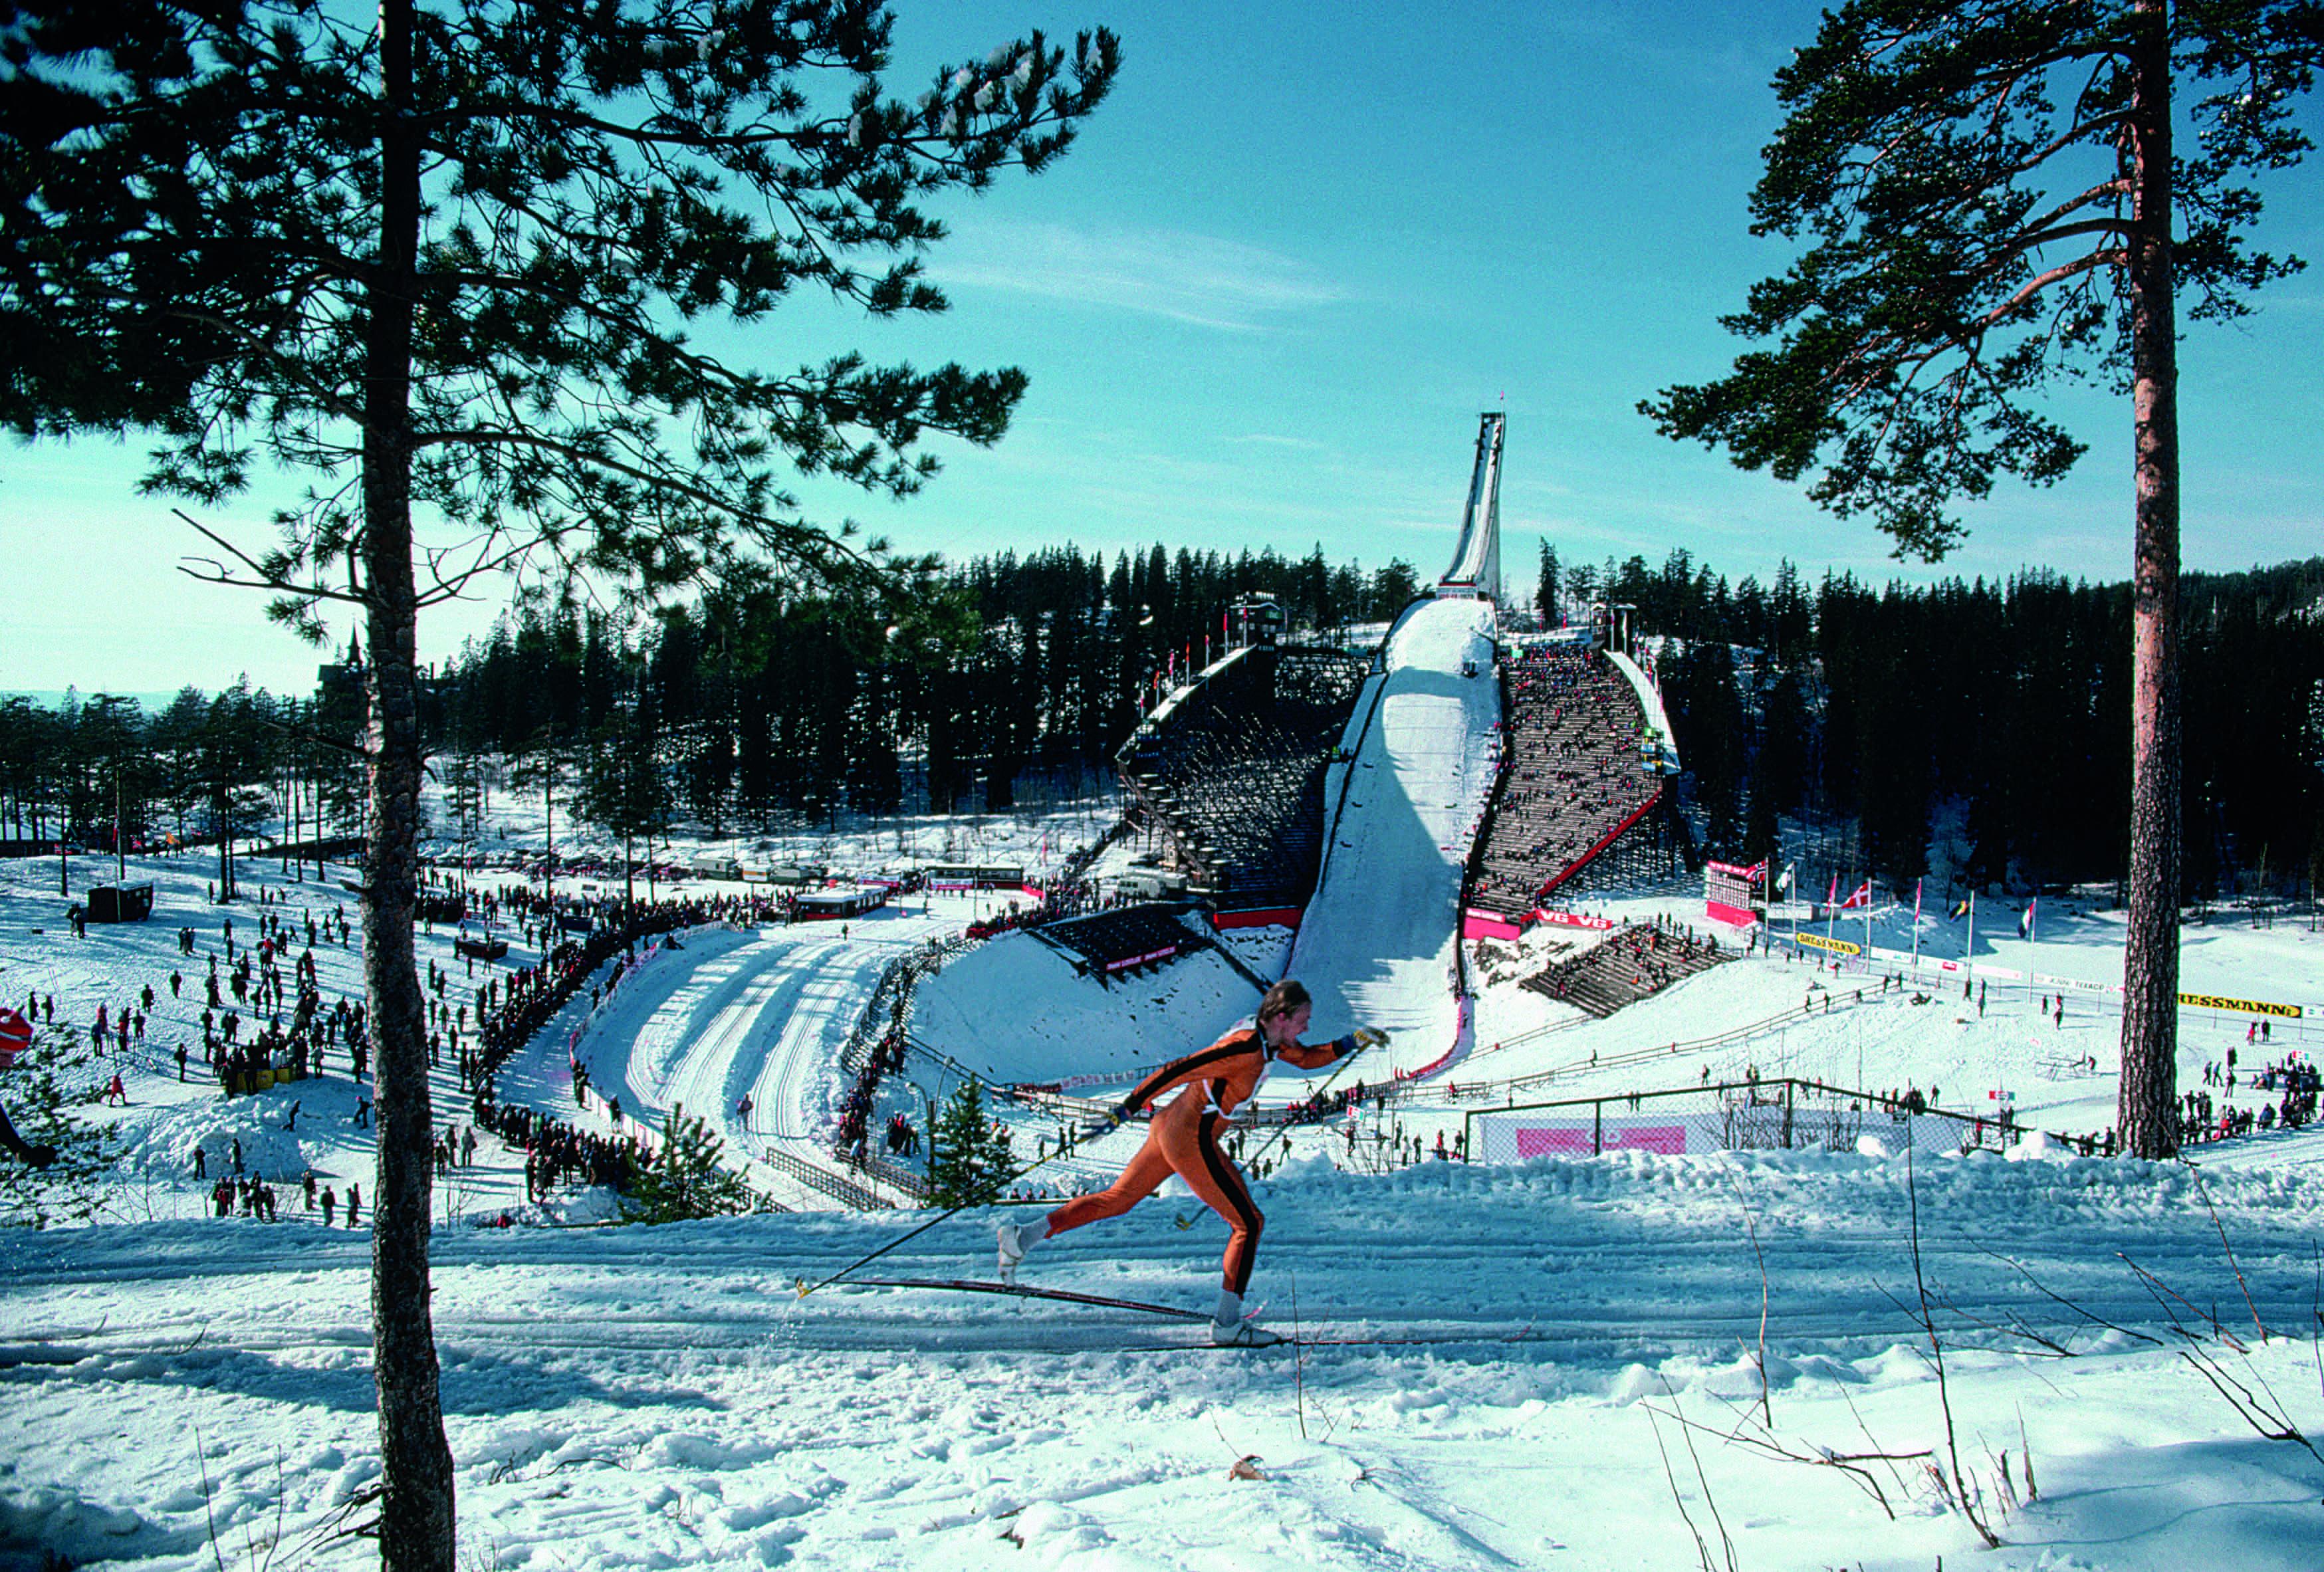 Skiing at Holmenkollen